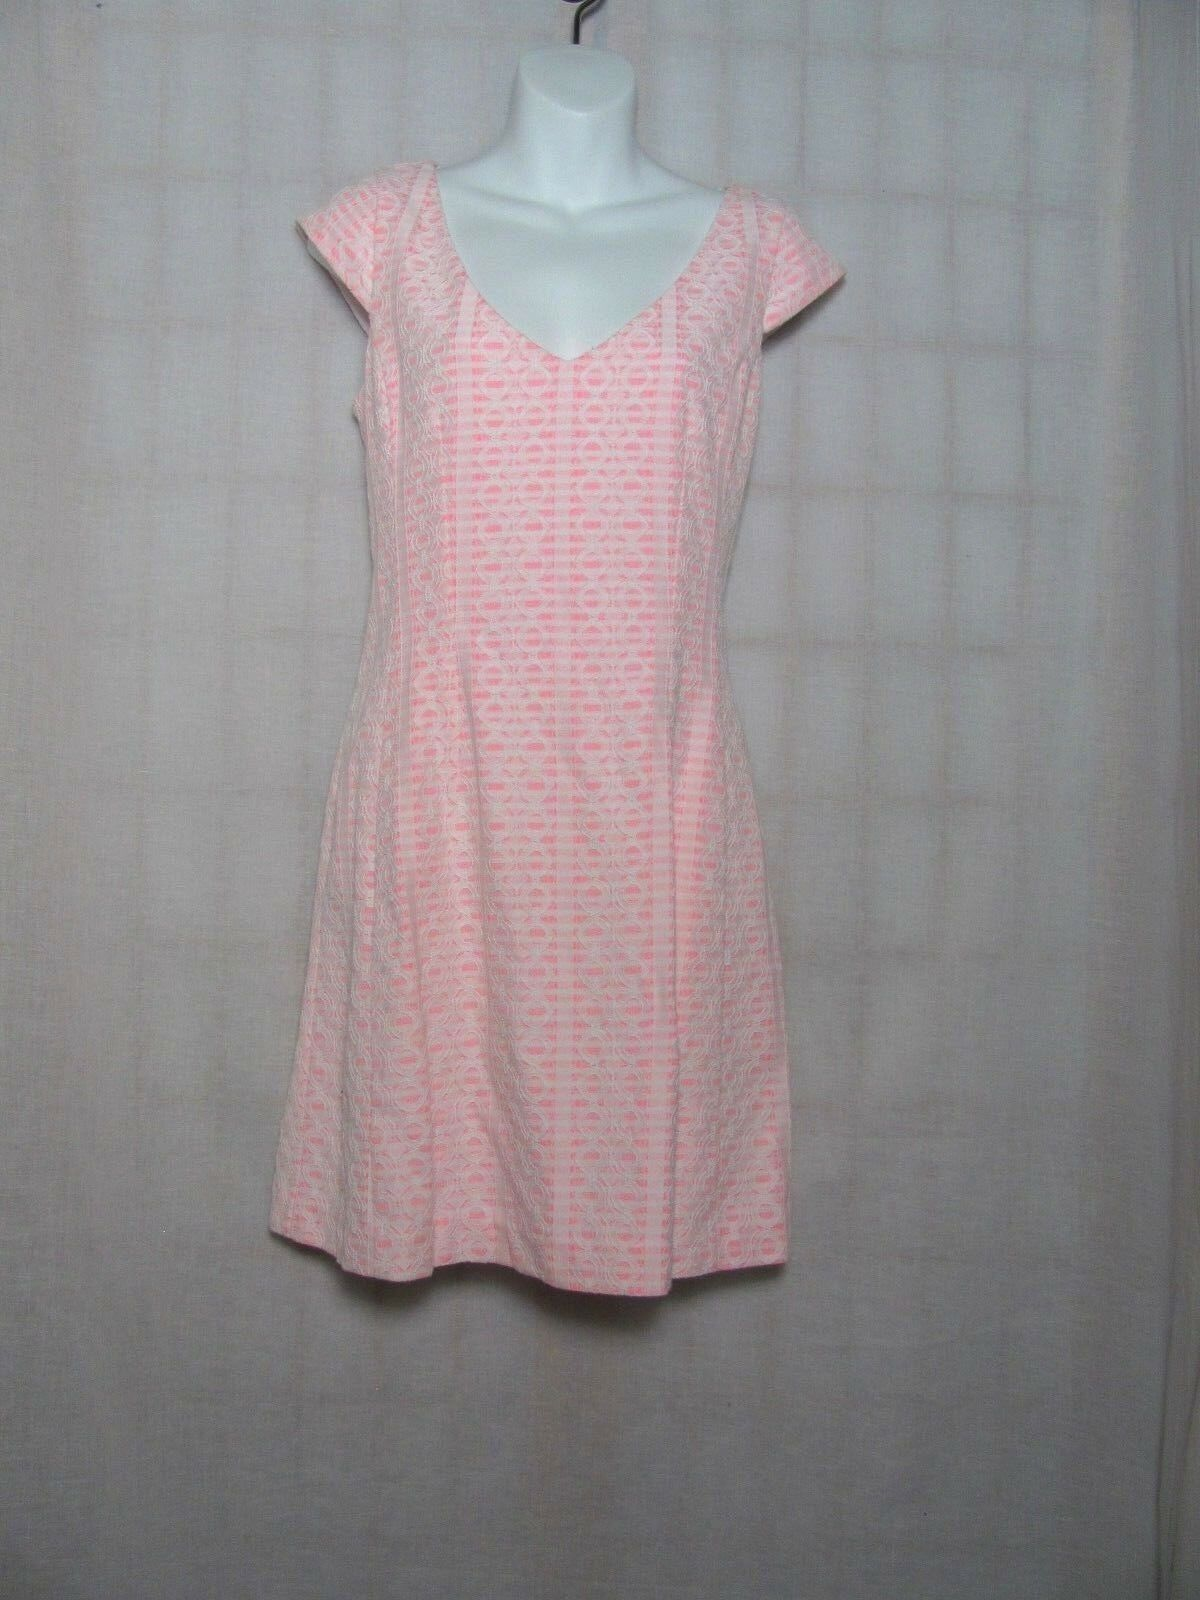 Lilly Pulitzer Lace Dress Pink Size Medium